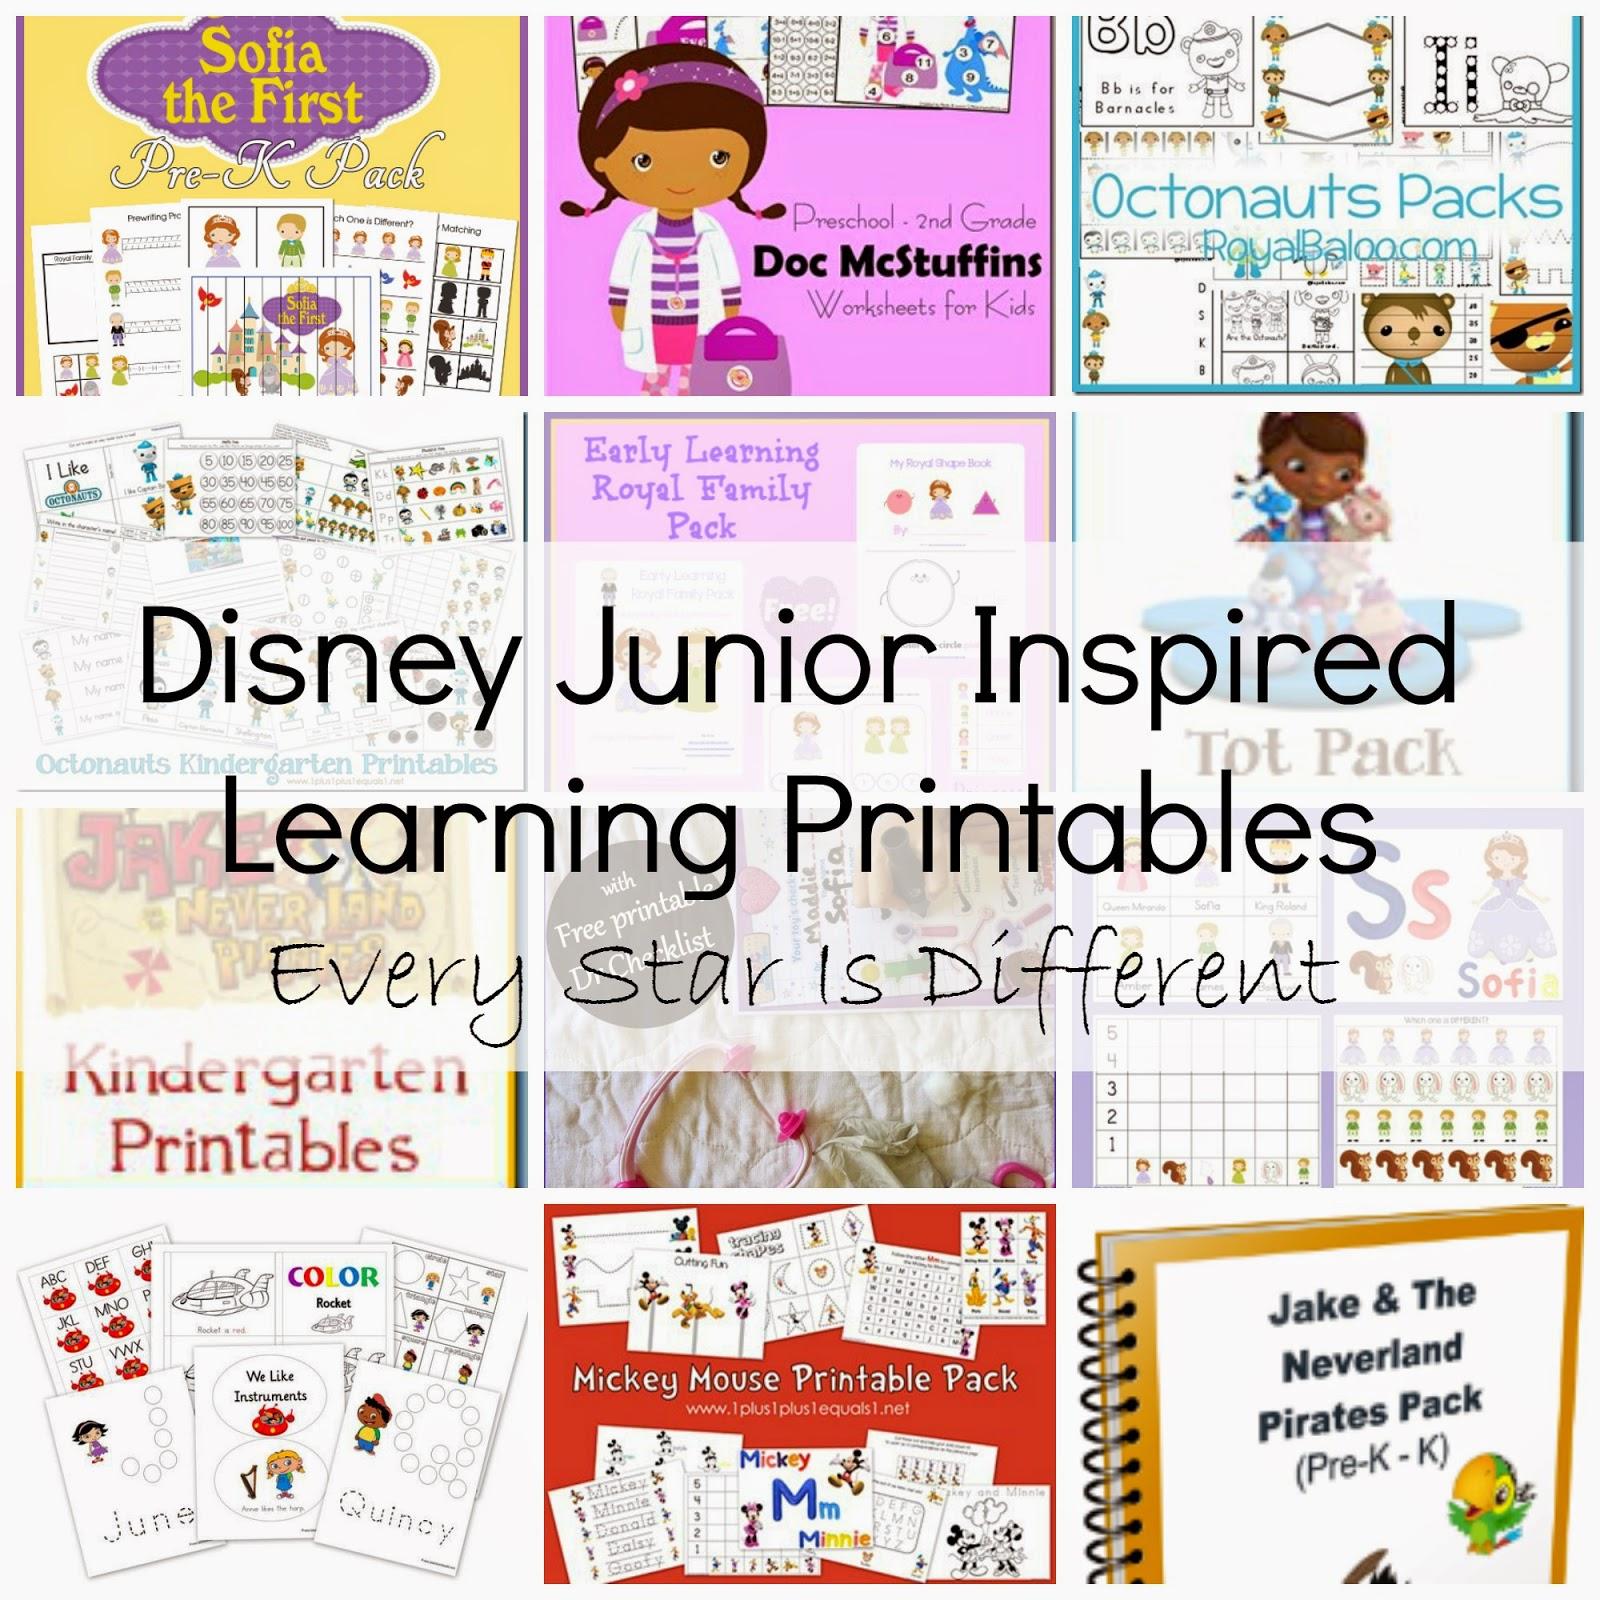 worksheet Disney Worksheets free disney inspired learning printable packs activities every lets get started